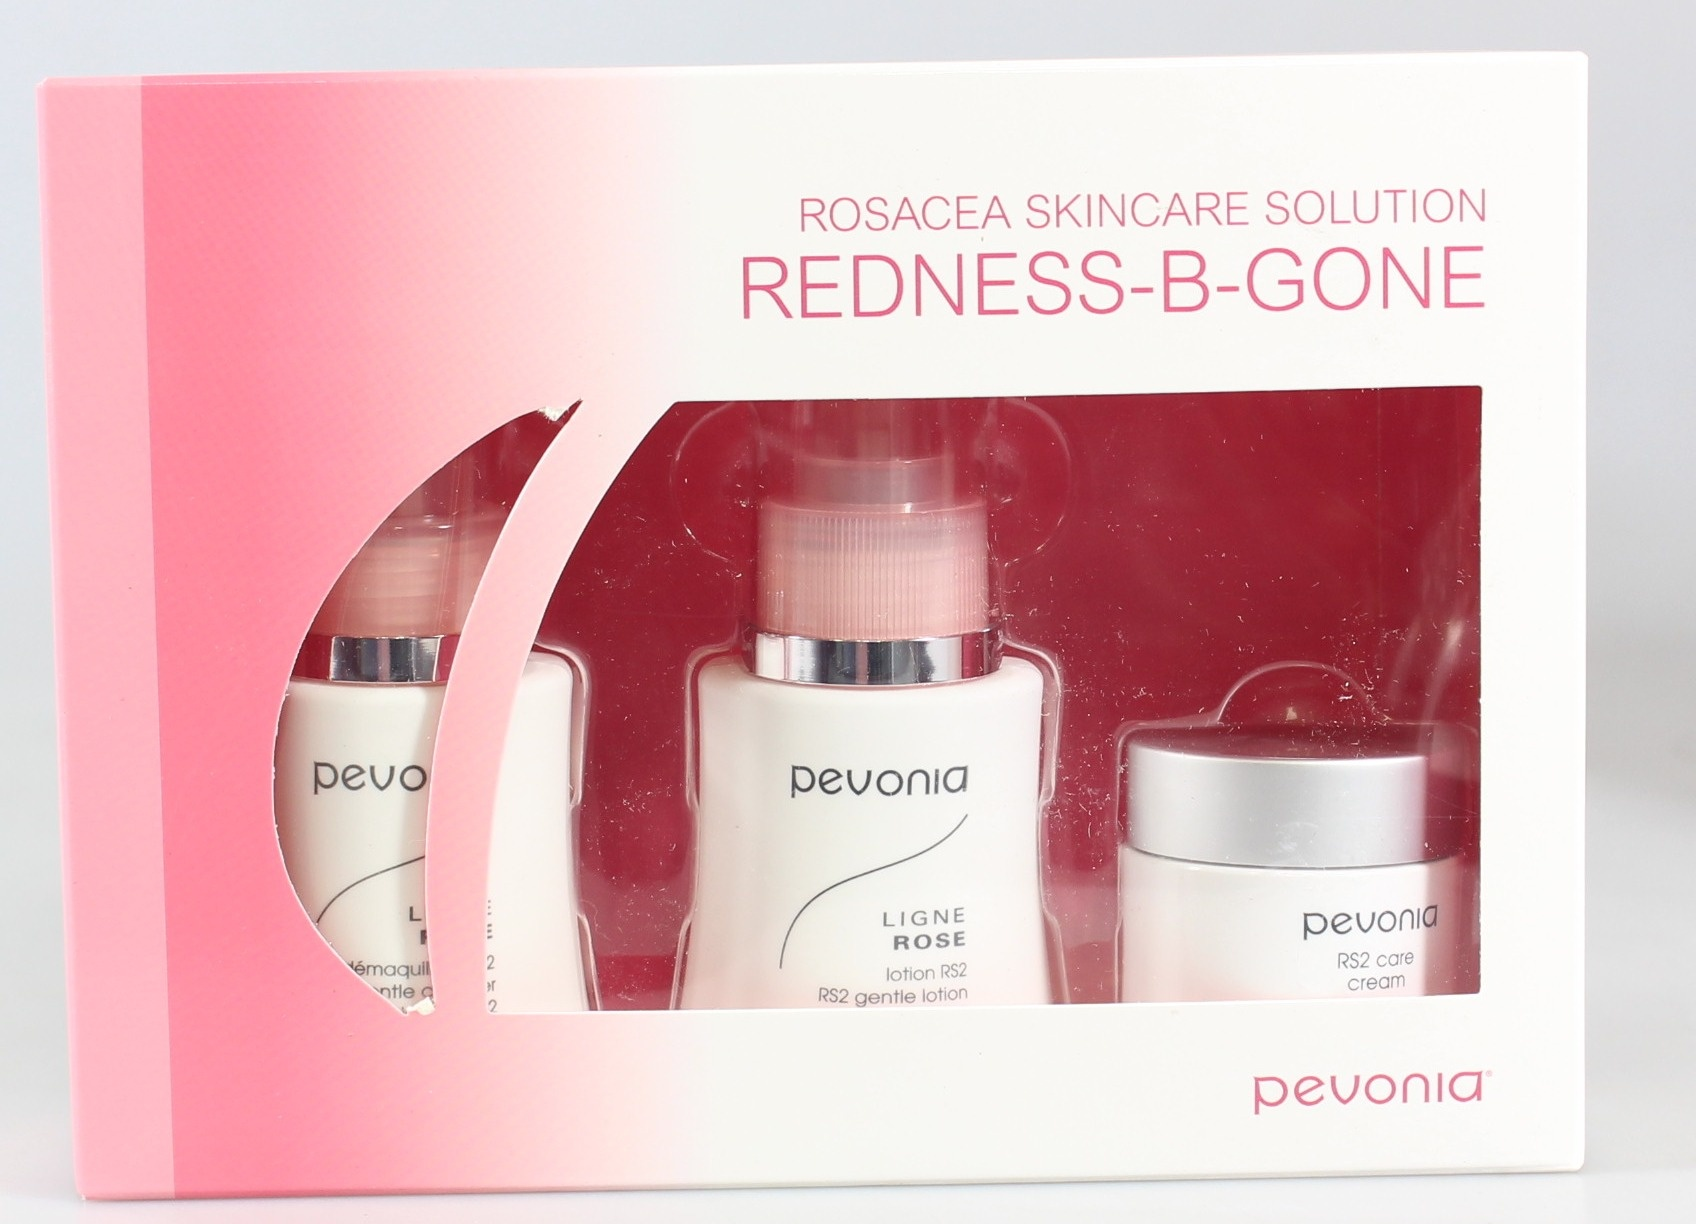 Pevonia Botanica Beauty Buy Online From Fishpond